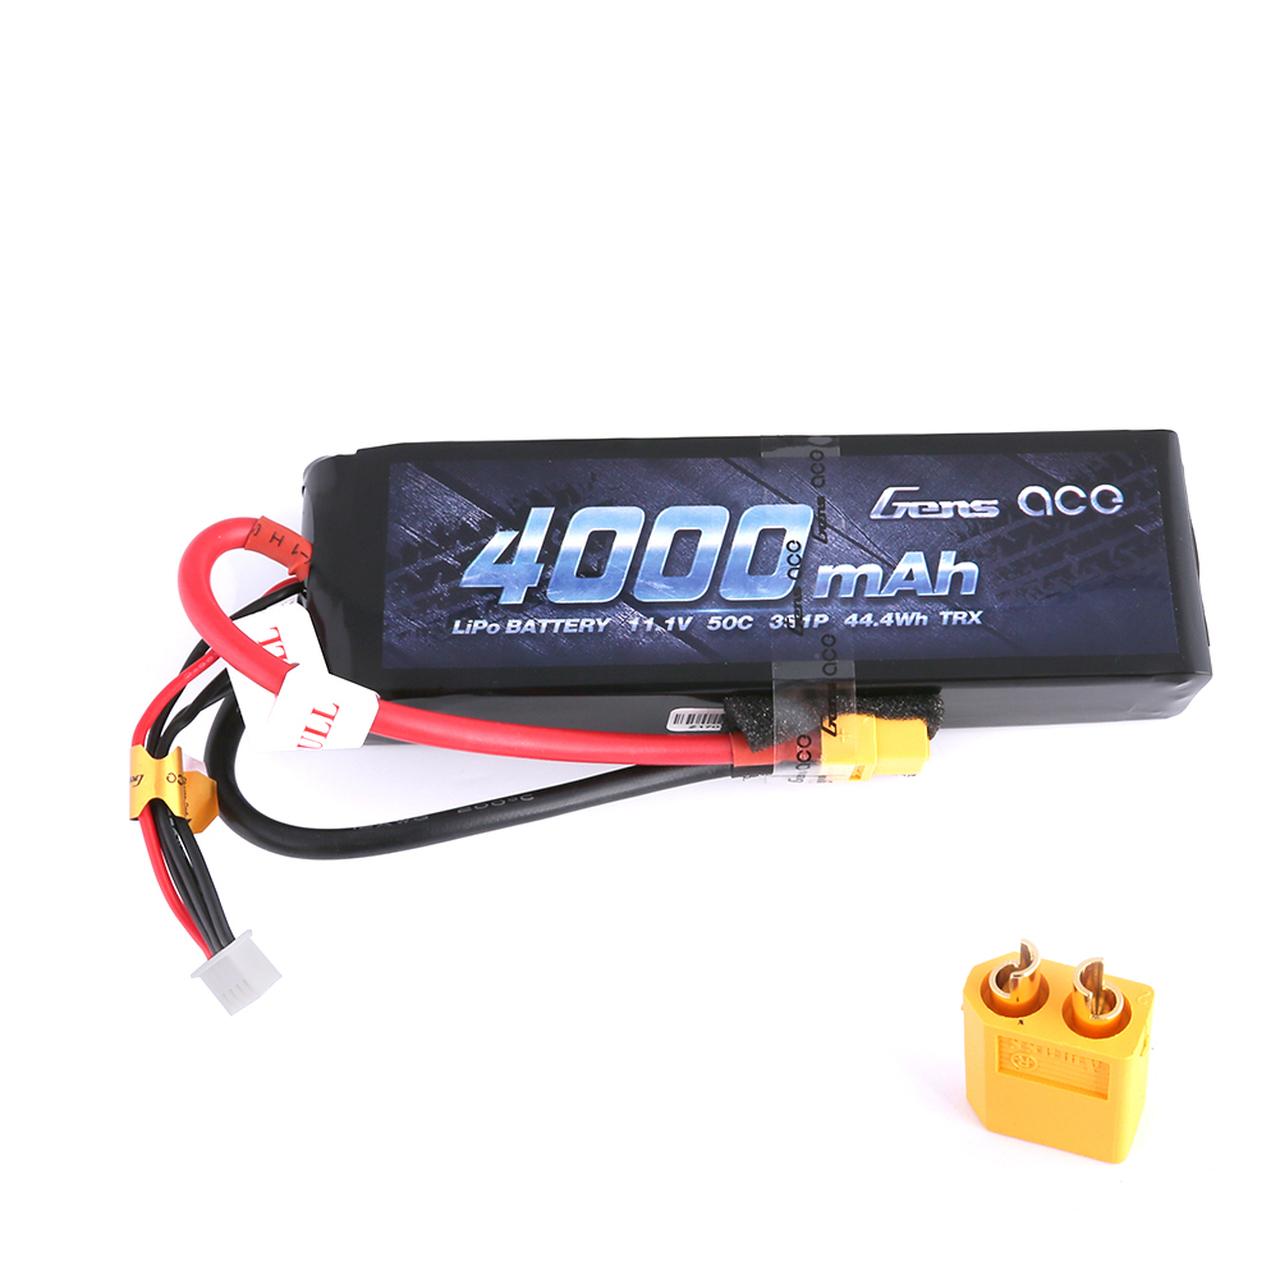 Gens ace 11.1V 50C 3S 4000mAh Lipo Battery Pack with XT60 Plug